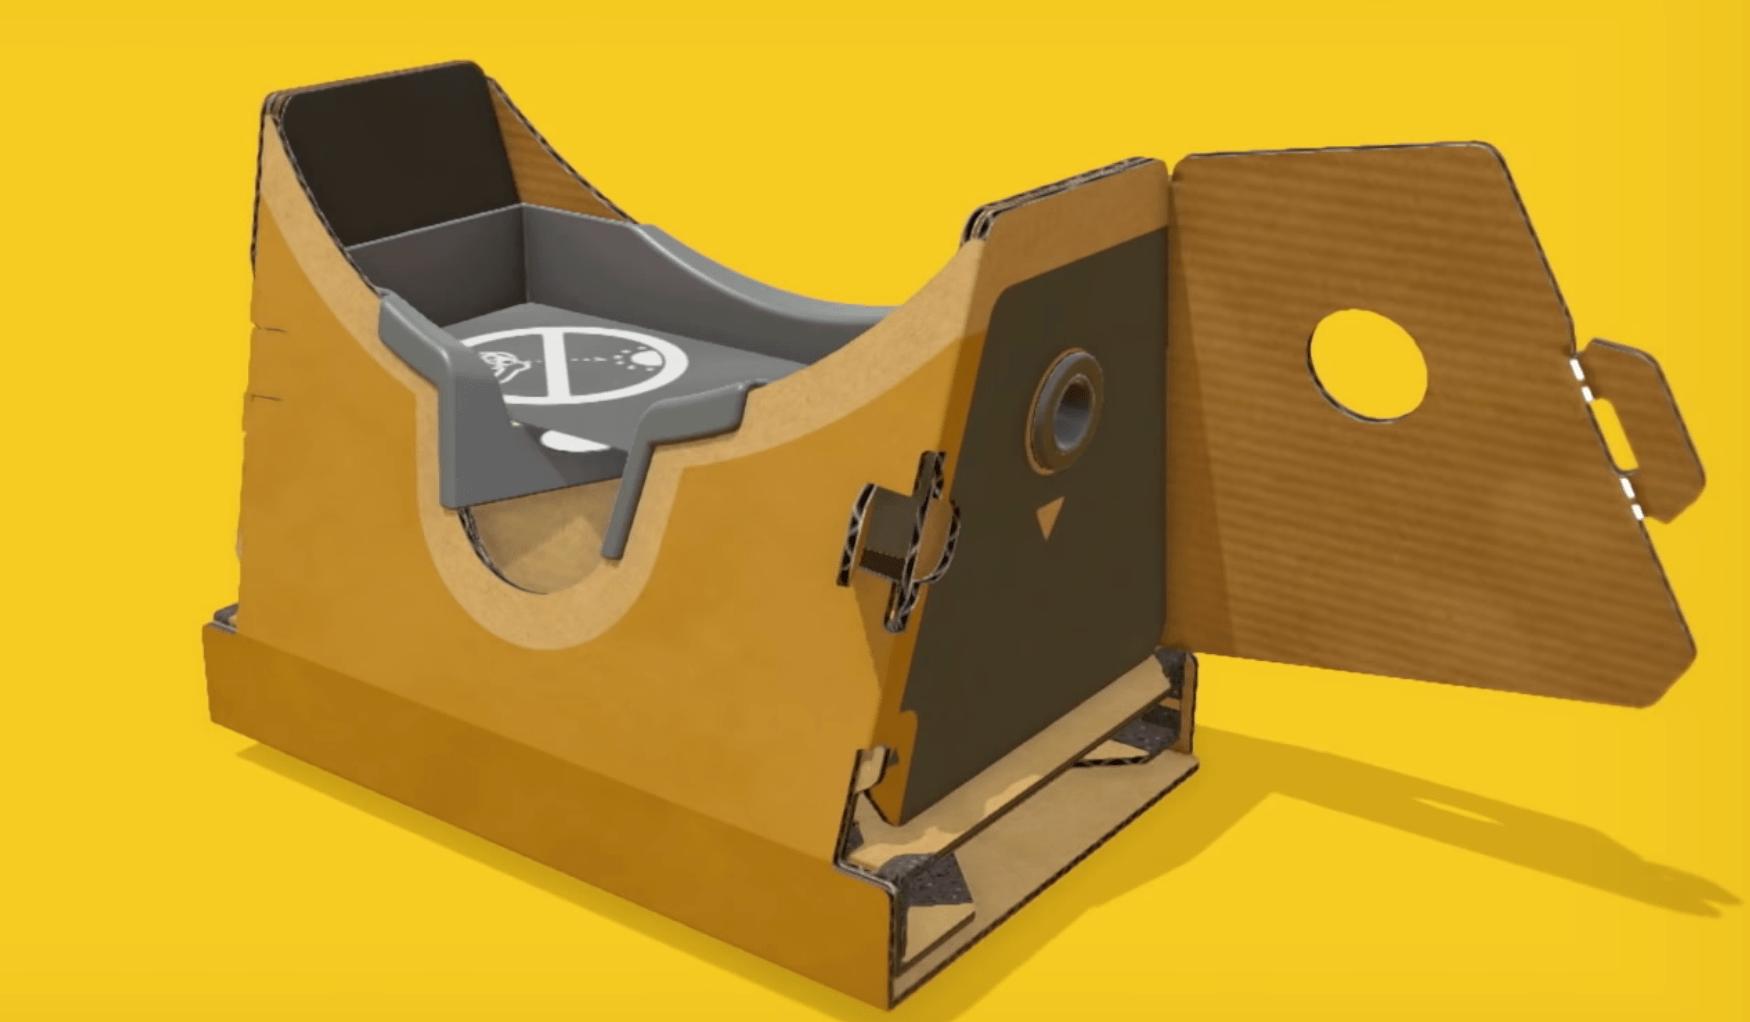 nintendo Labo VR headset